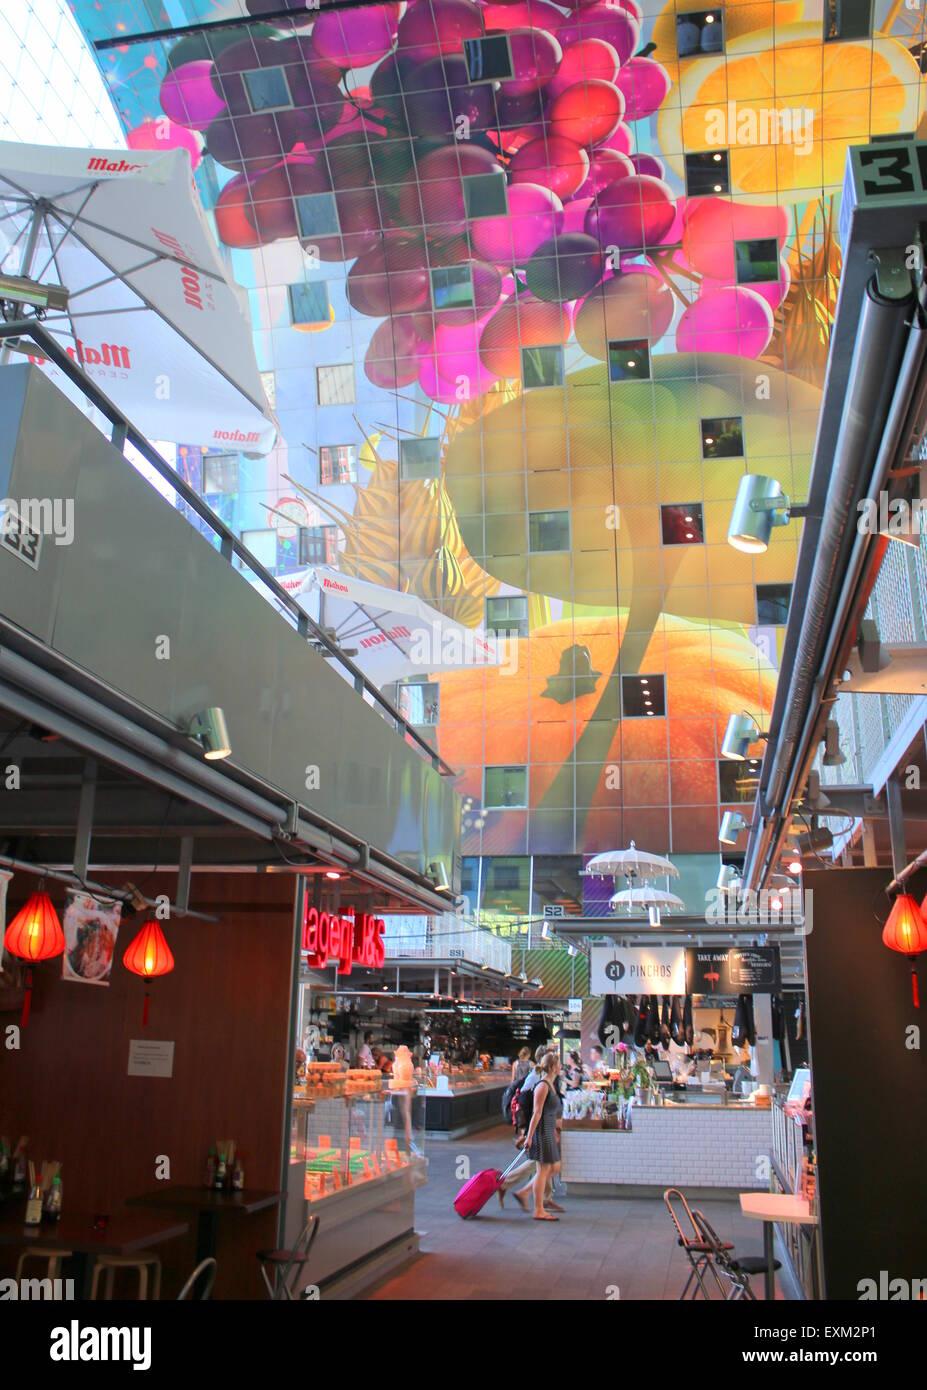 Colourful interior of the Rotterdamse Markthal (Rotterdam Market hall), at Blaak square. Stock Photo